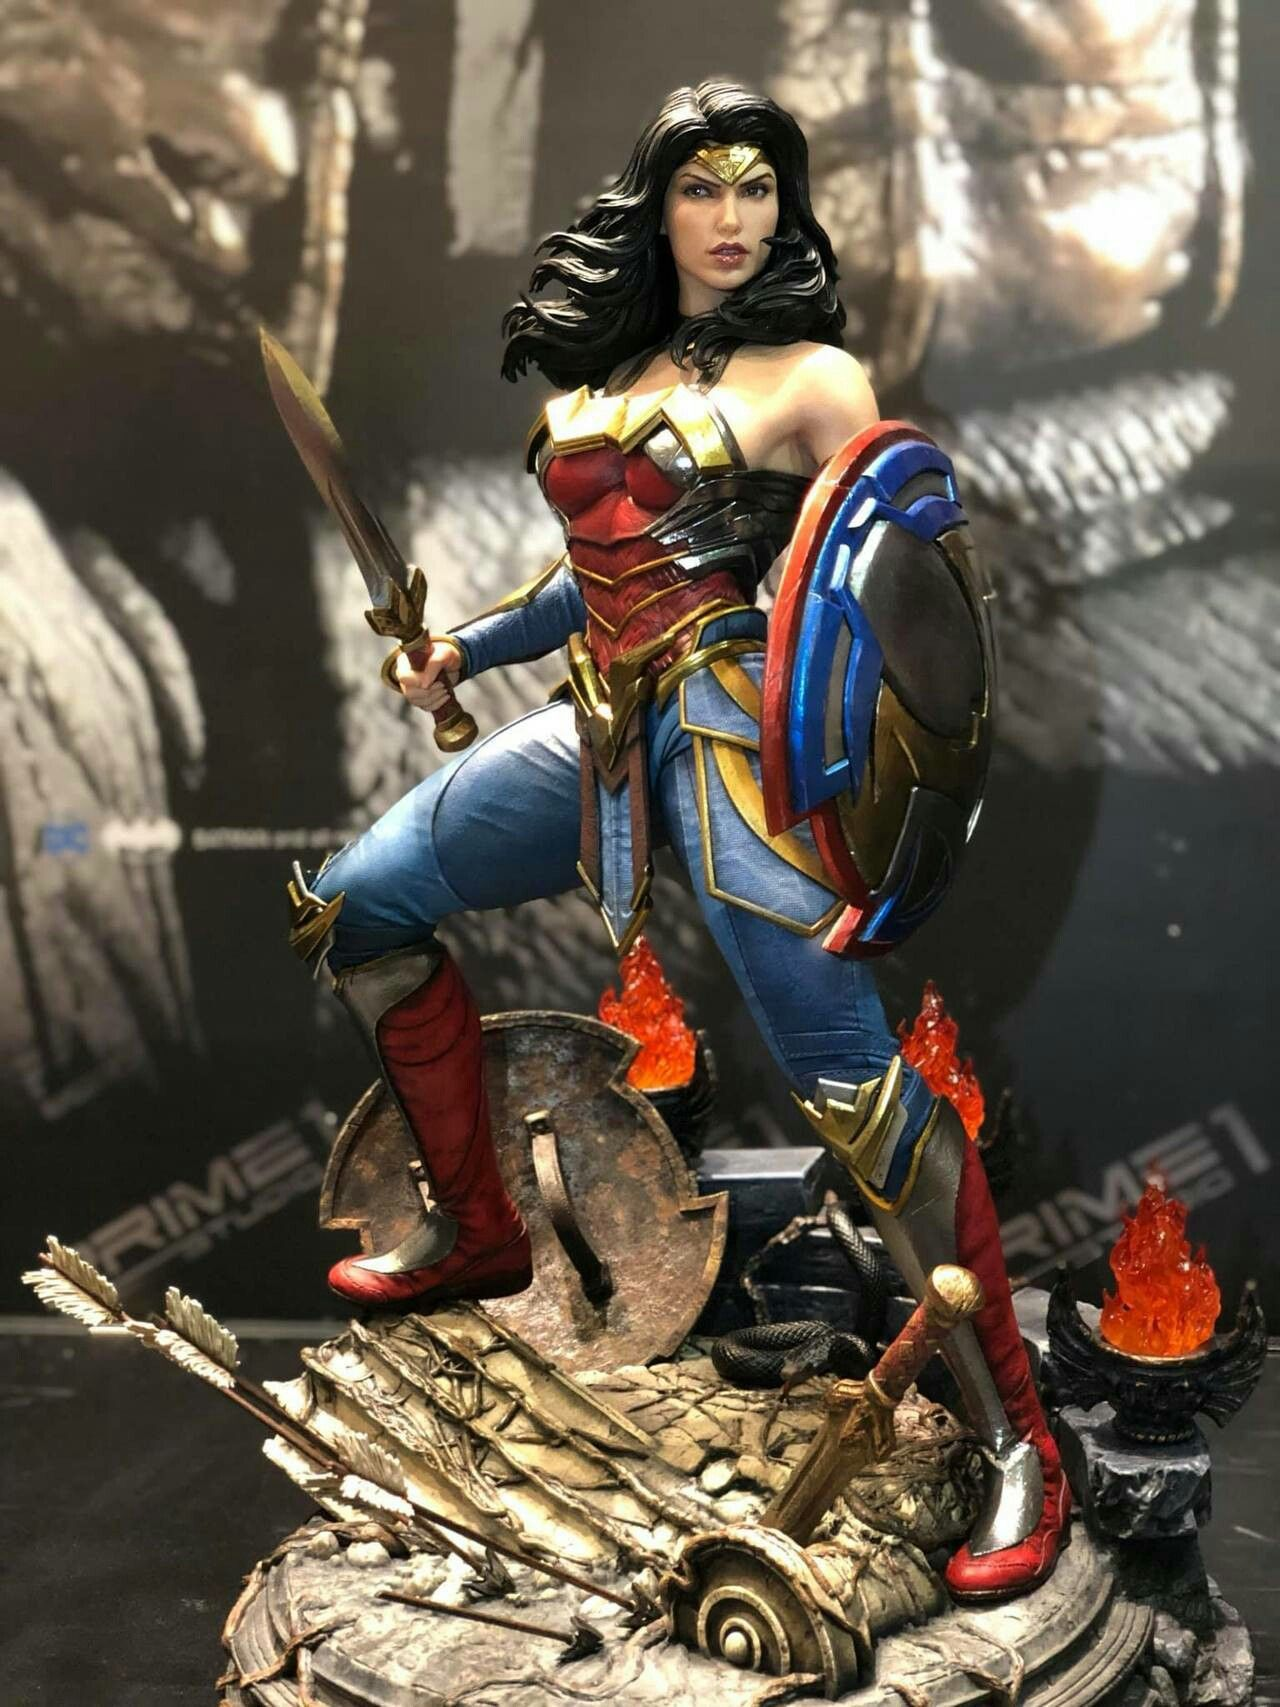 Wonder Woman Injustice 2 Statue By Prime 1 Studio Wonder Woman Warrior Woman Injustice 2